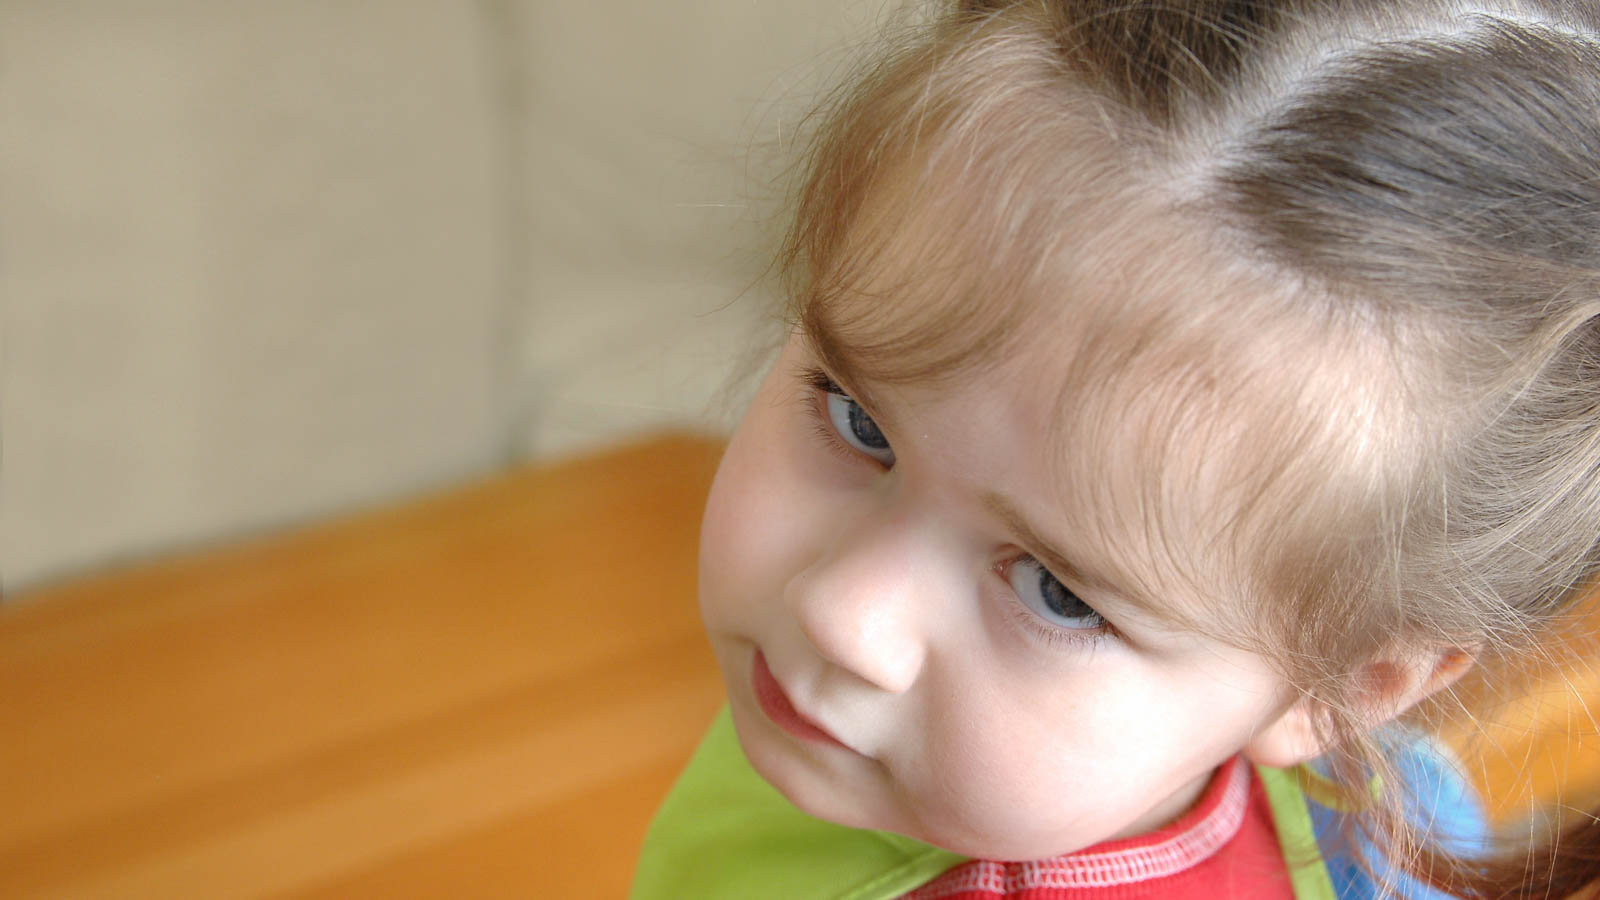 stubborn girl making expressive face